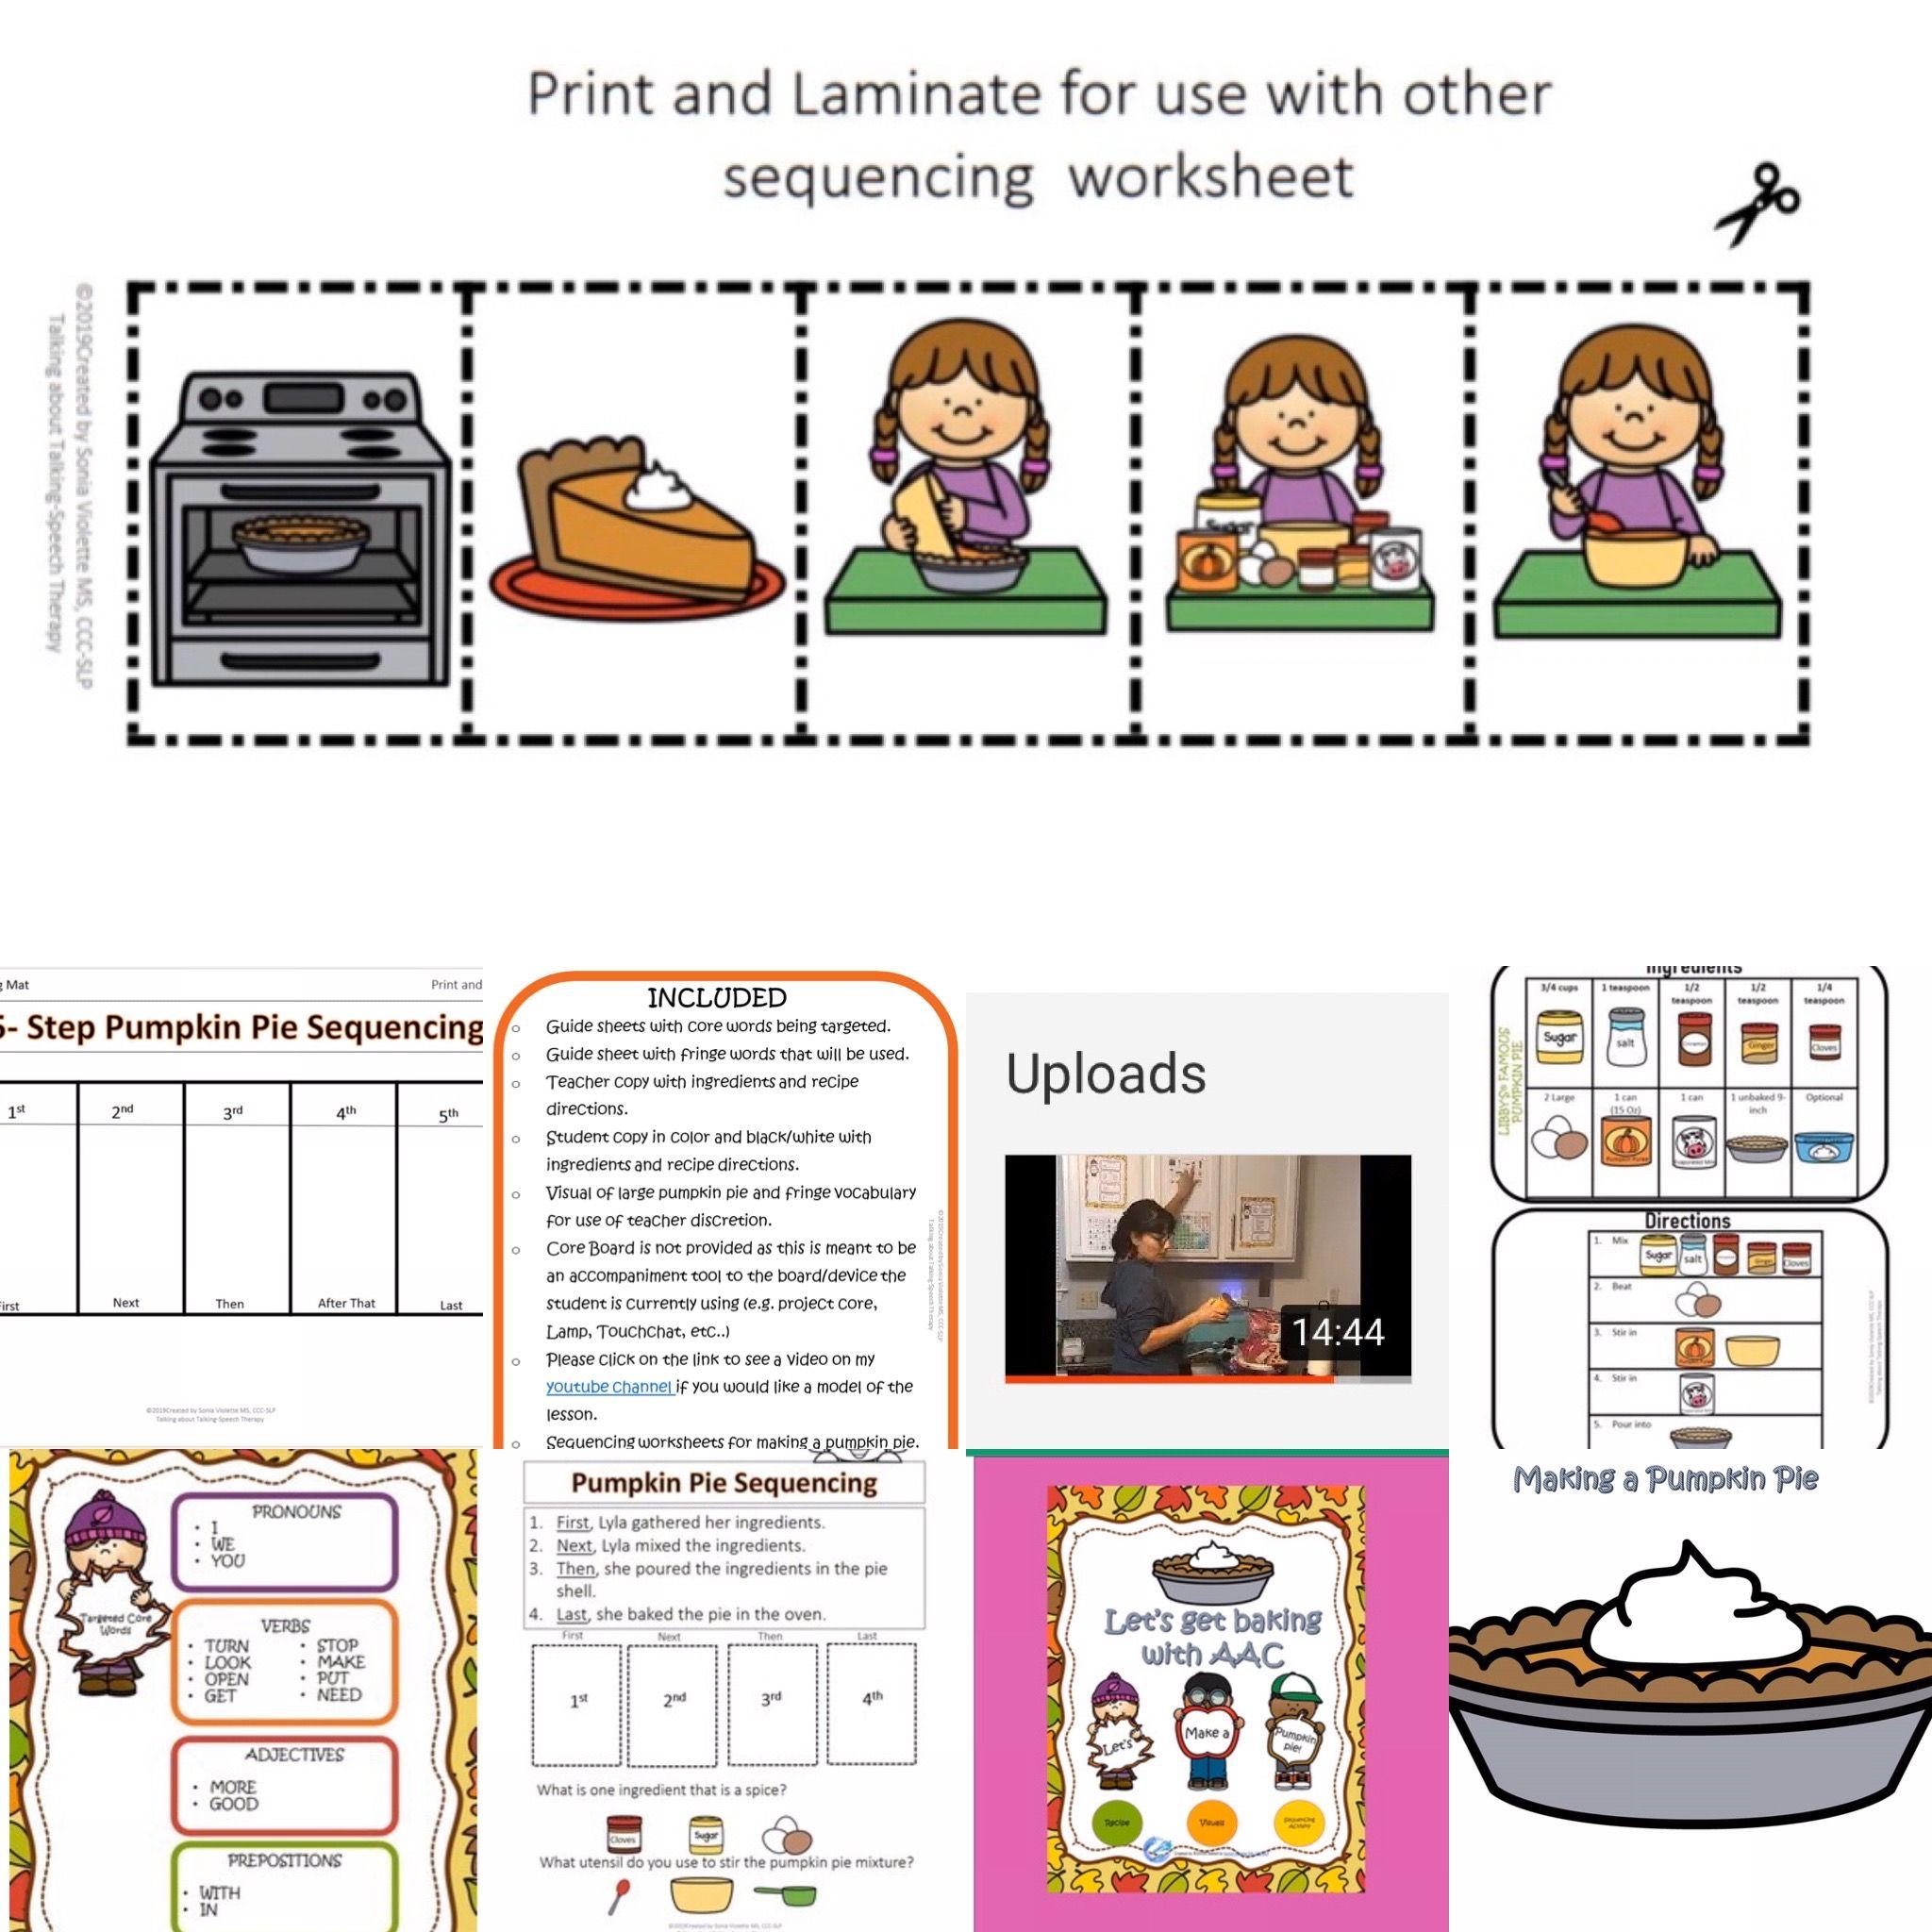 Aac Let S Make A Pumpkin Pie Visual Recipe